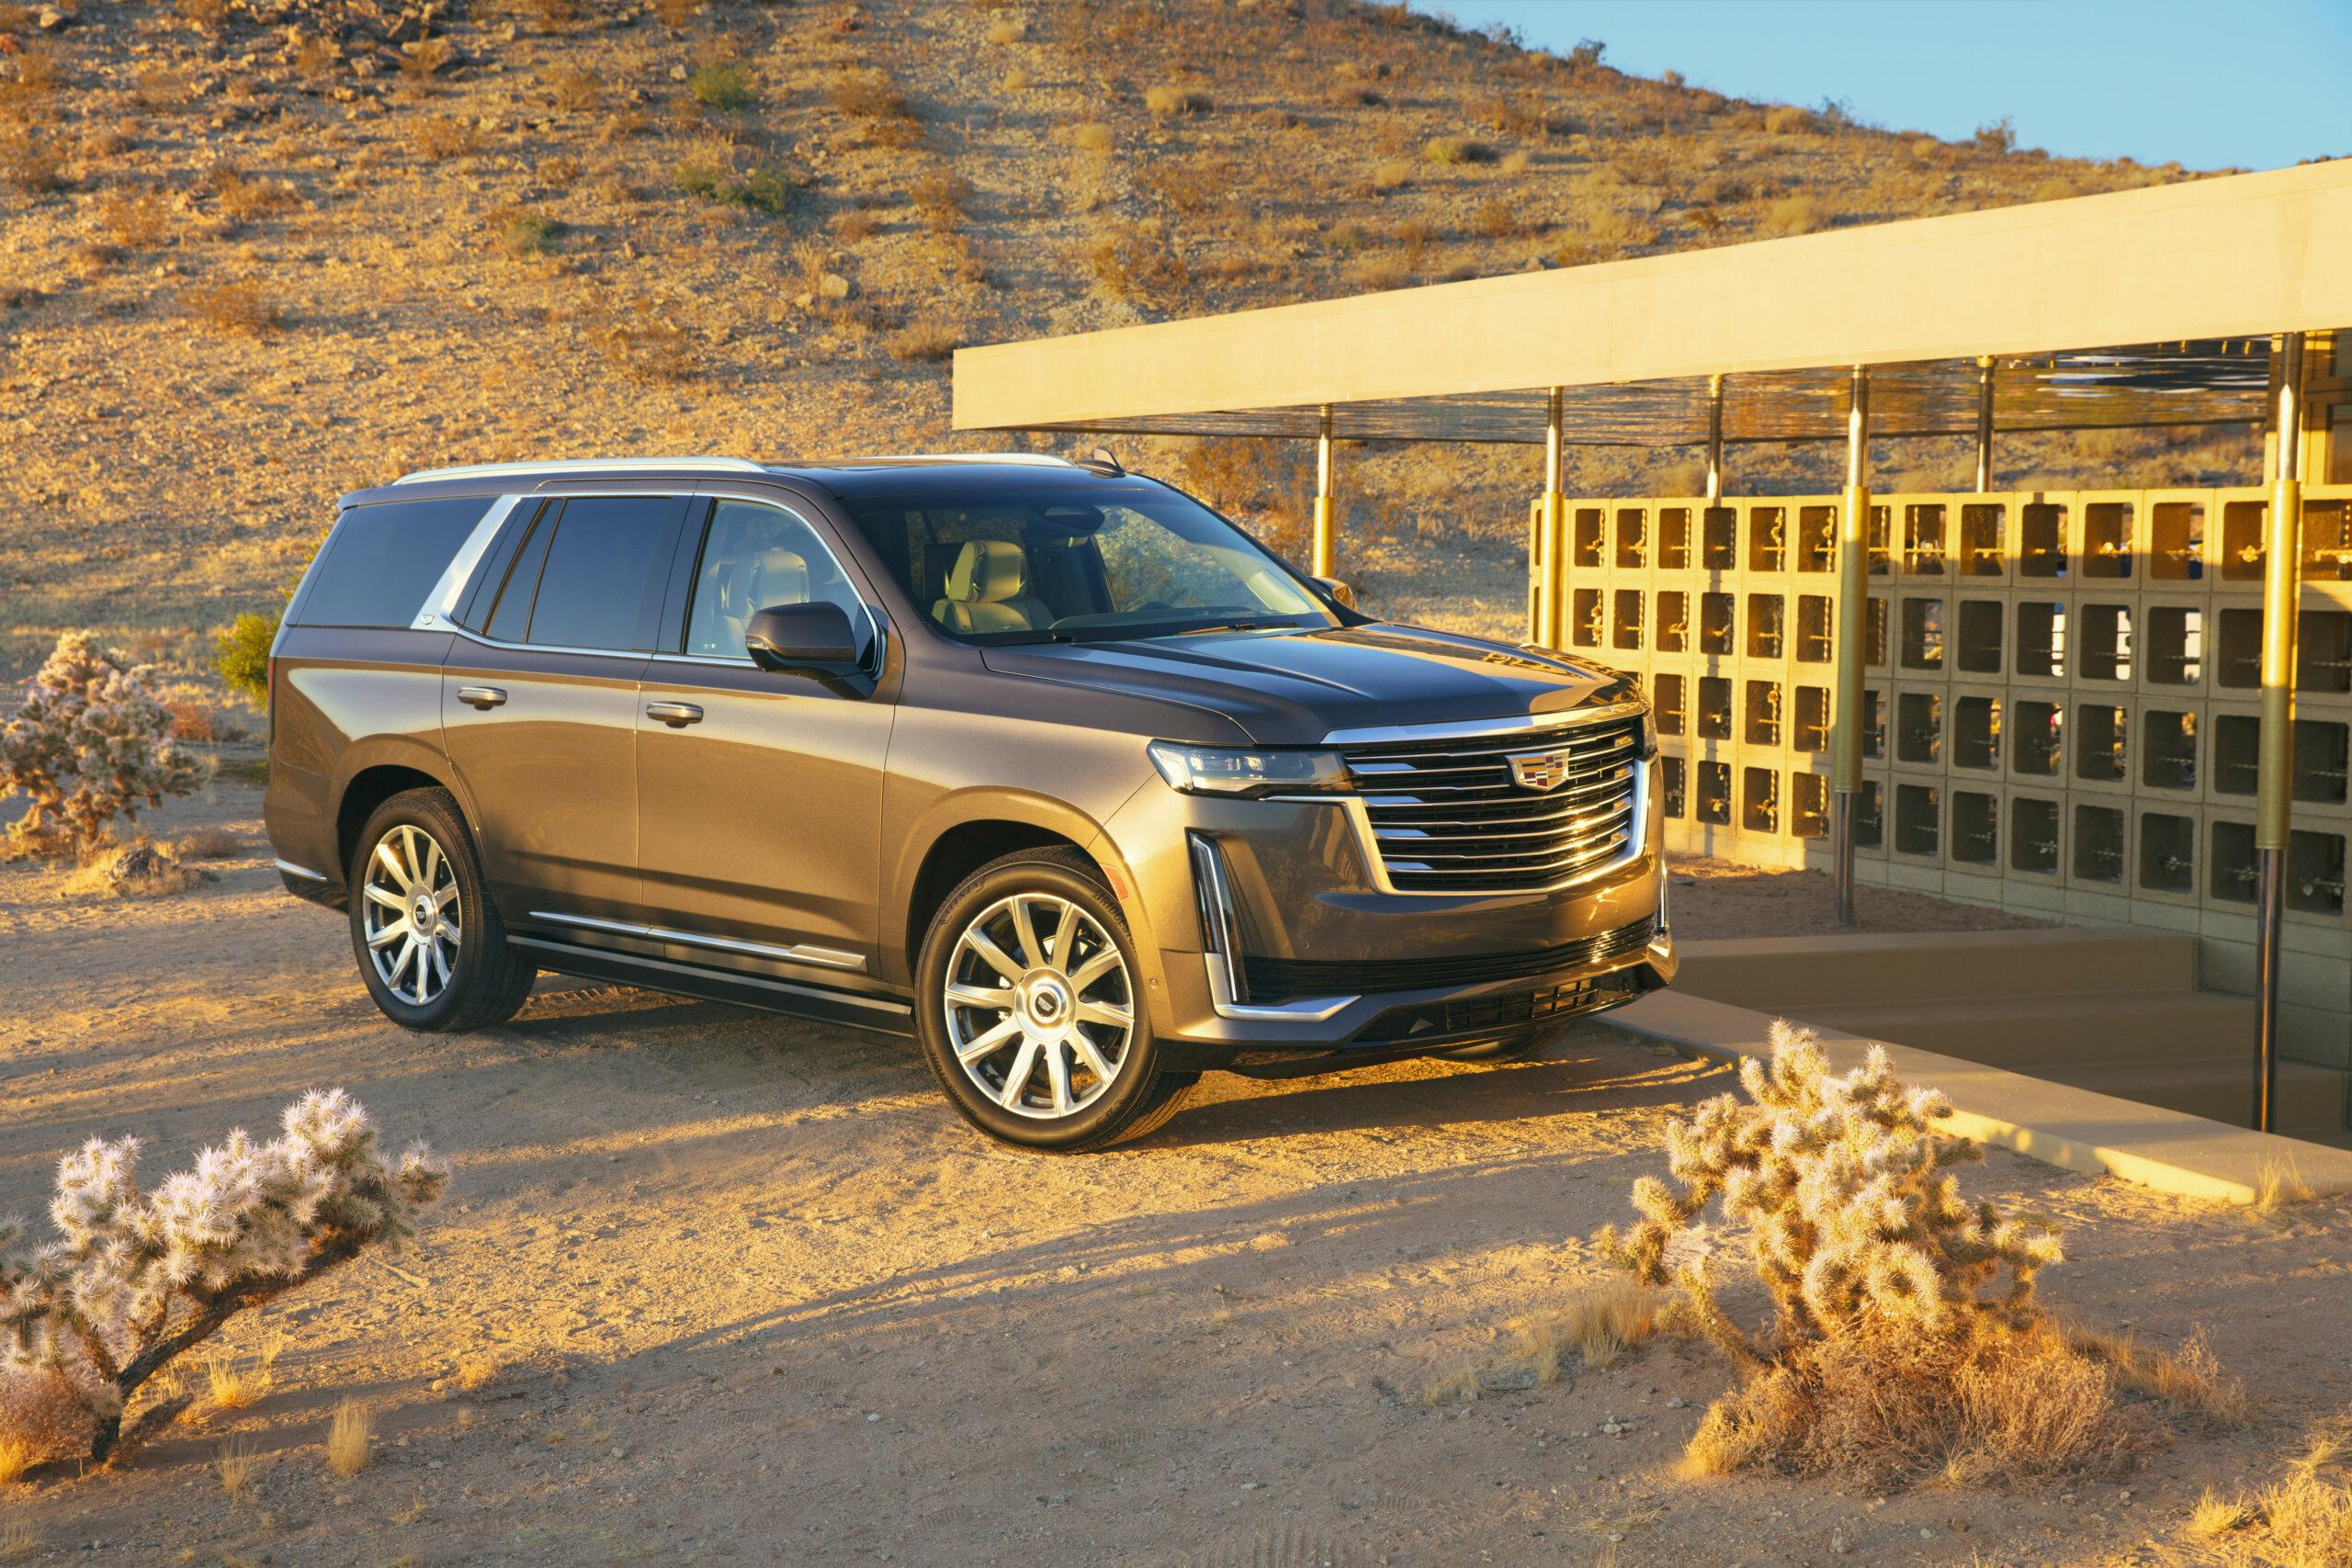 Price Build 2022 Cadillac Escalade